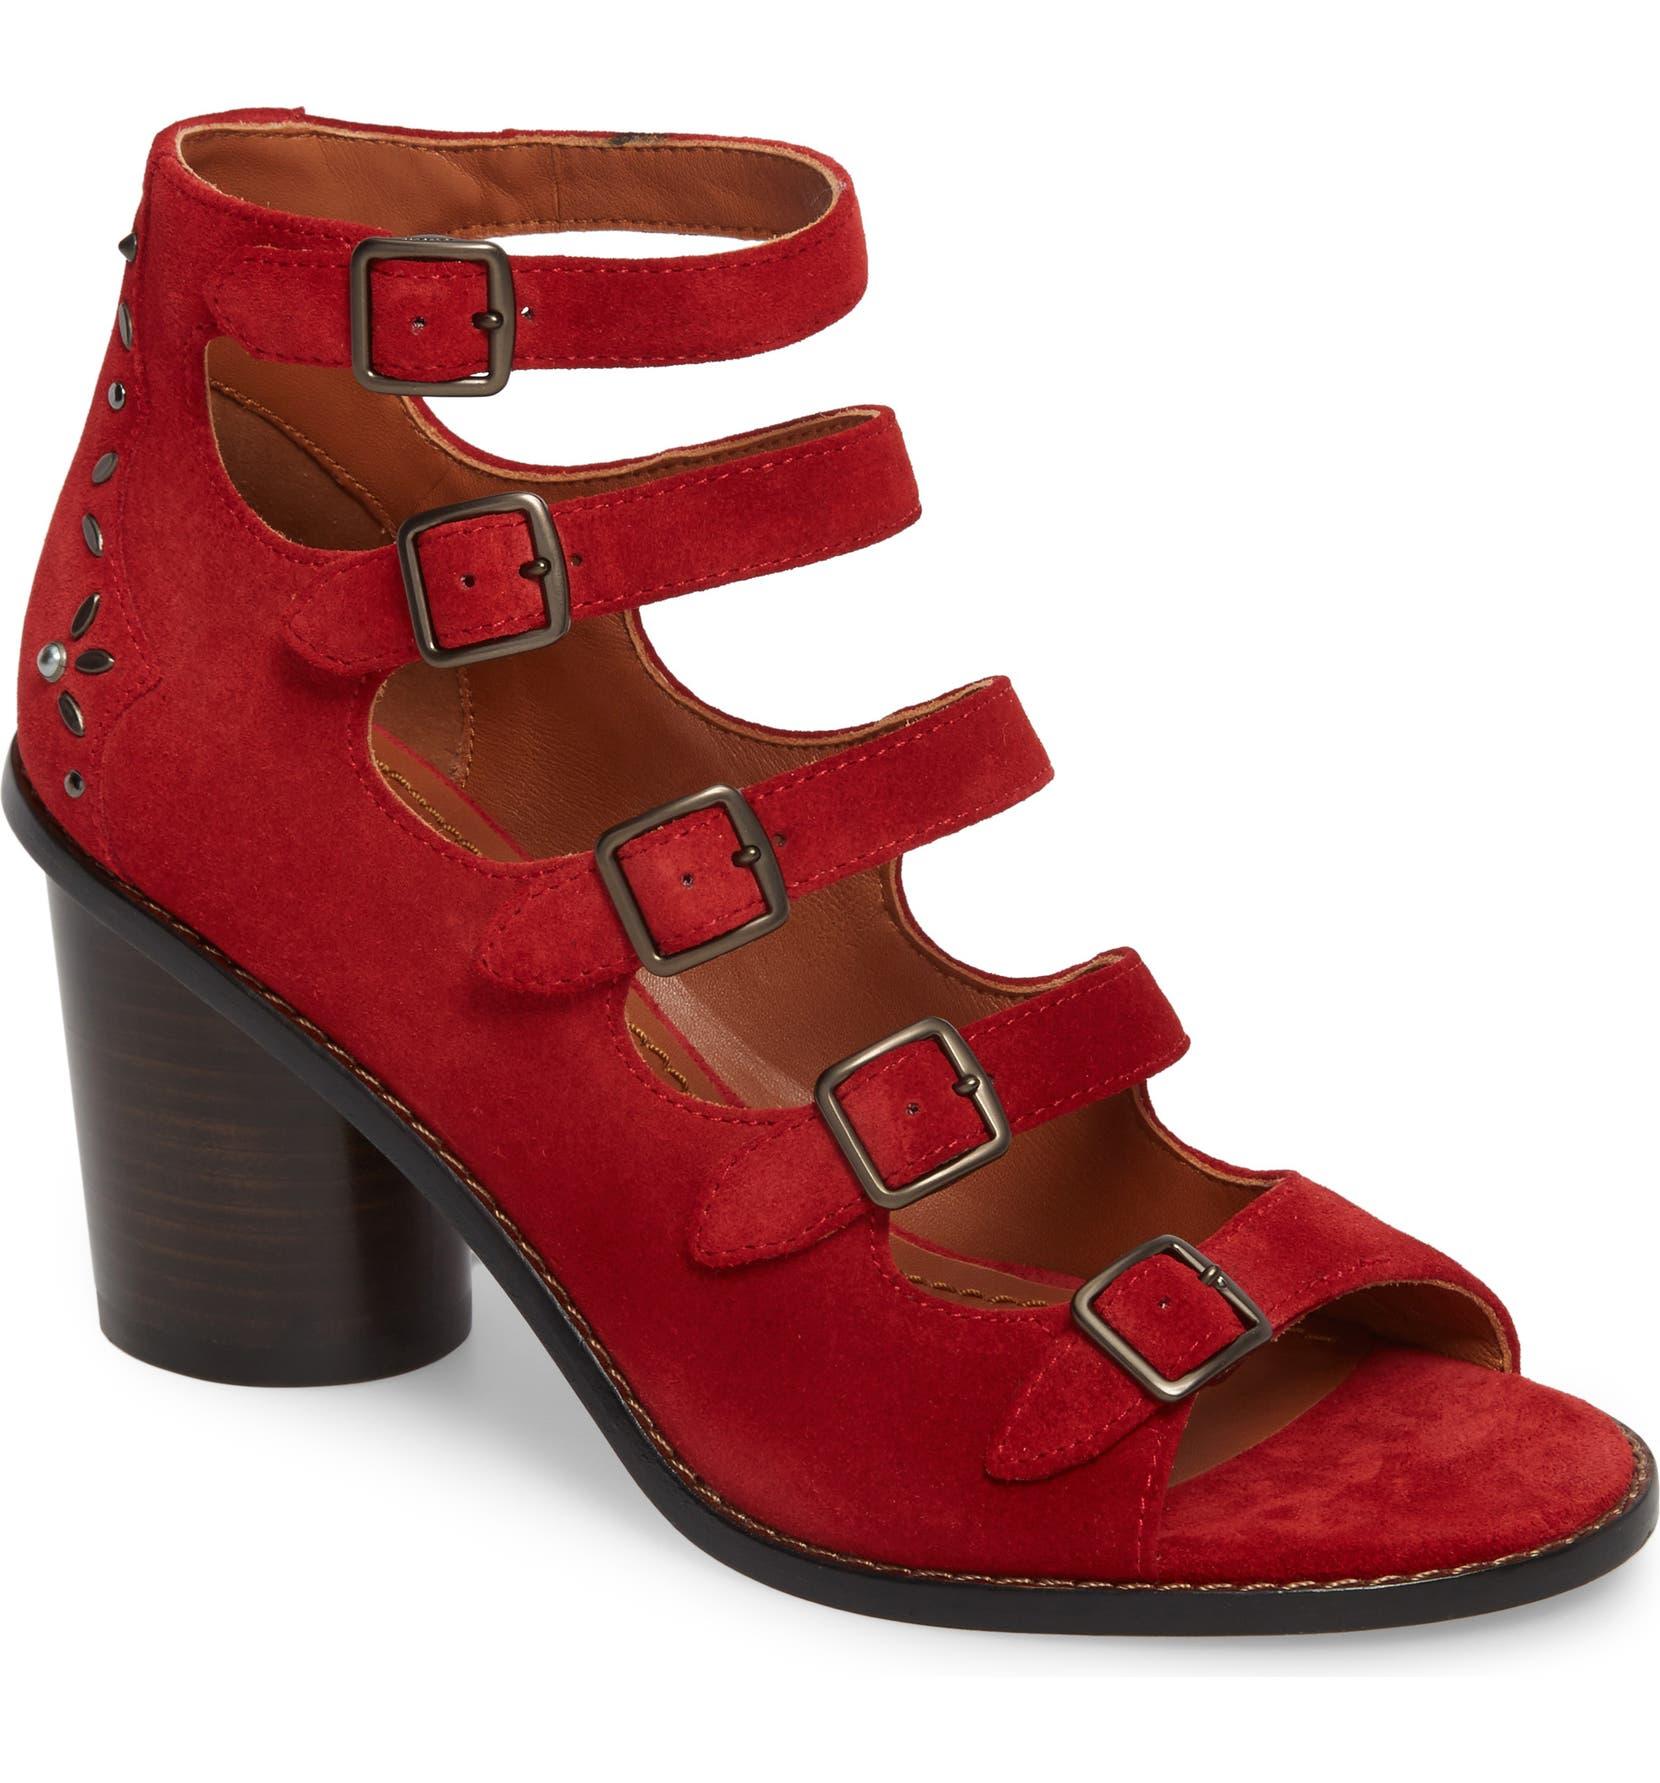 036cf7239f24 COACH Prairie Rivet Buckle Sandal (Women)